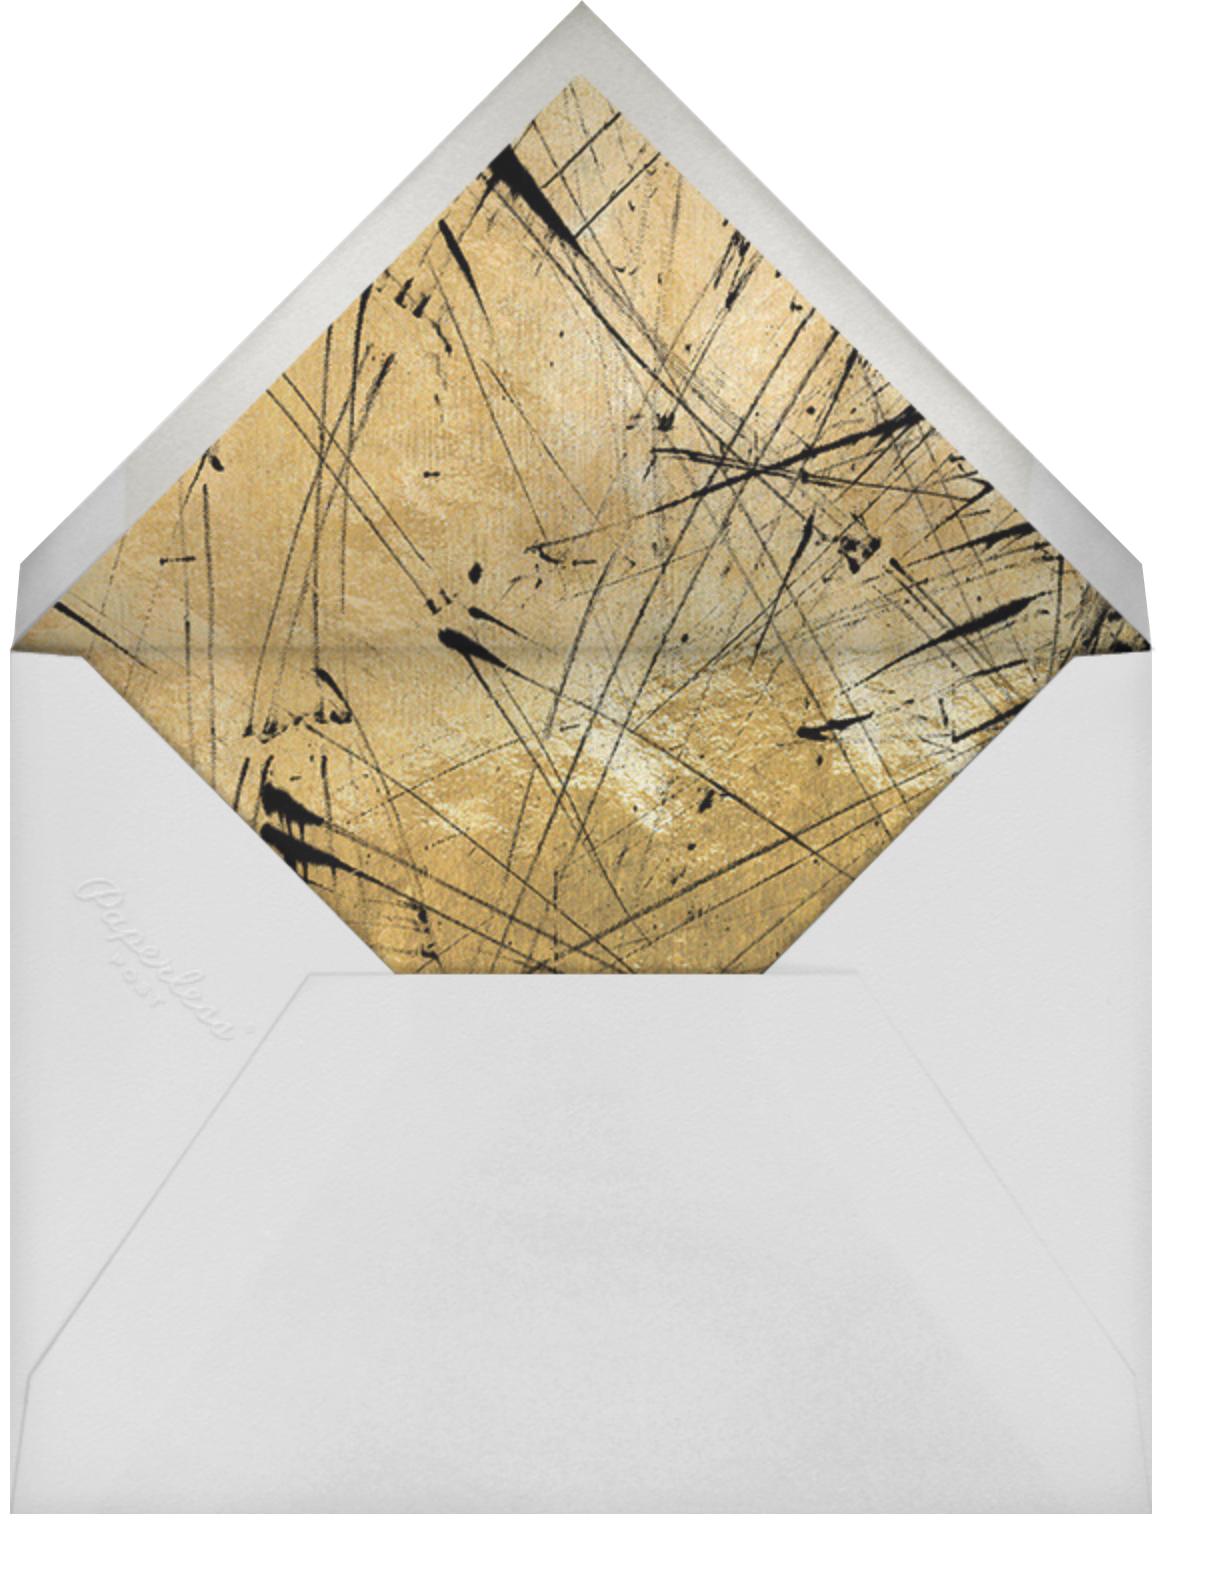 Mezzo Pearl - Cream - Kelly Wearstler - New Year's Eve - envelope back